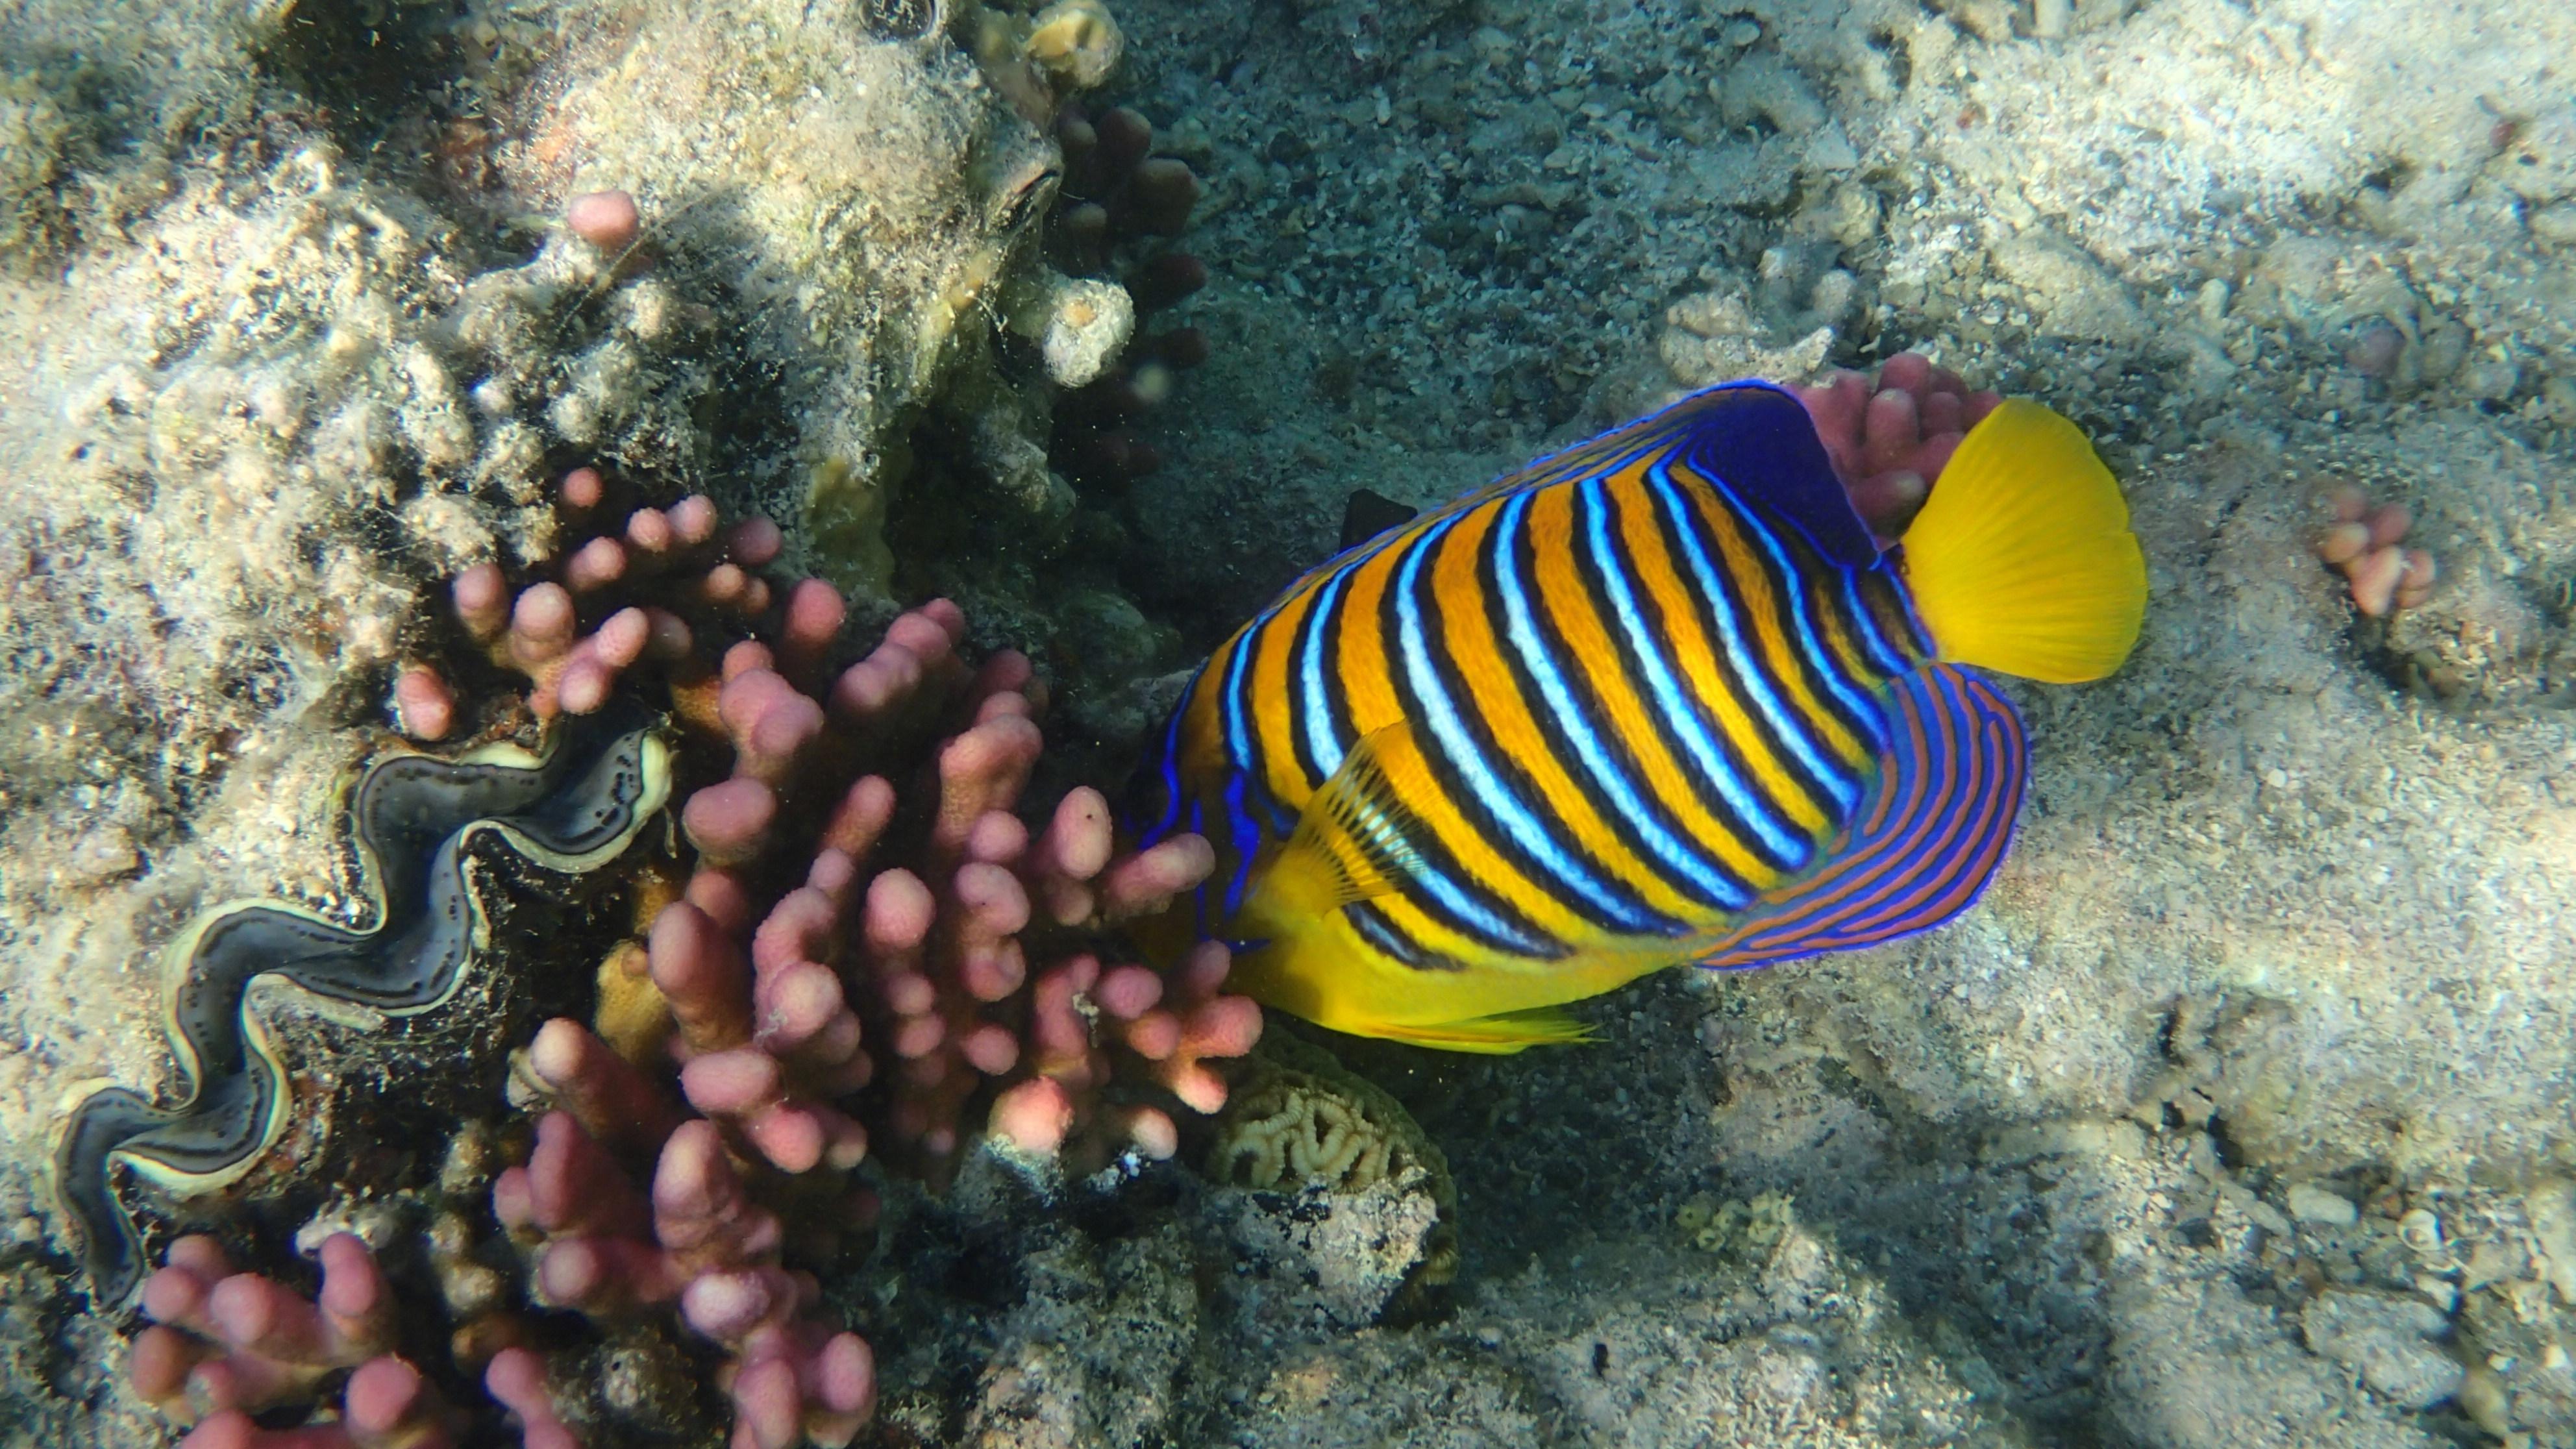 Королевская рыба-ангел (лат. Pygoplites diacanthus , анг.Royal angelfish)